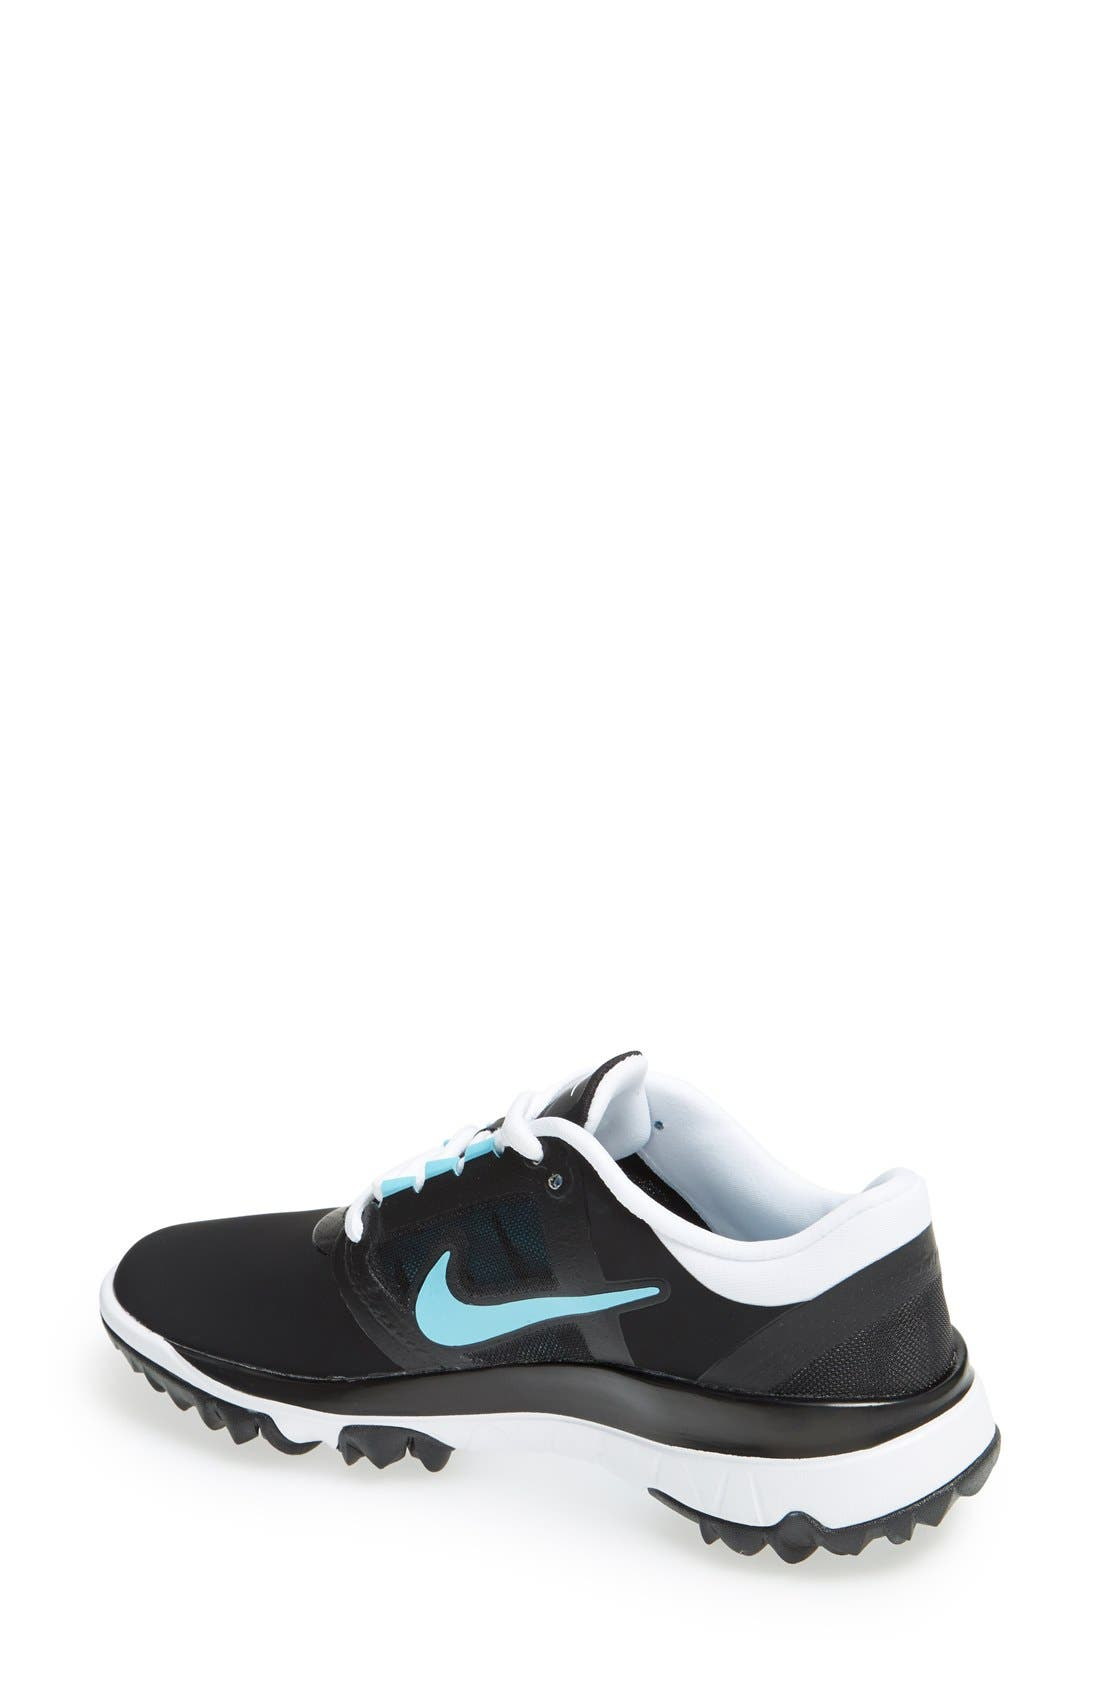 Alternate Image 2  - Nike 'Fi Impact' Waterproof Golf Shoe (Women)